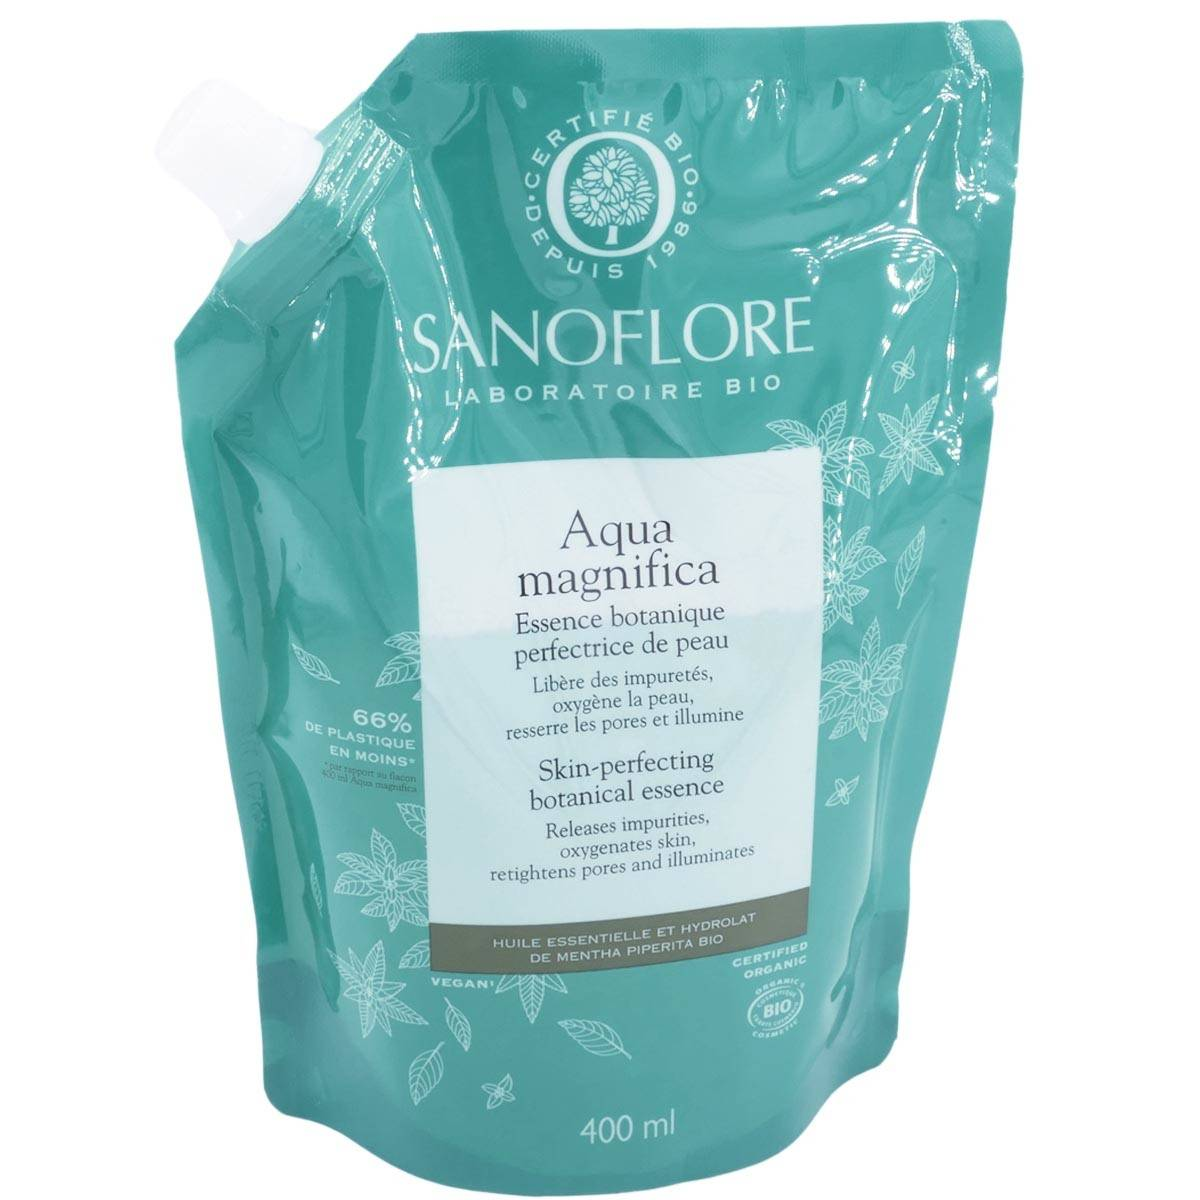 Sanoflore aqua magnifica essence perfectrice peau 400ml